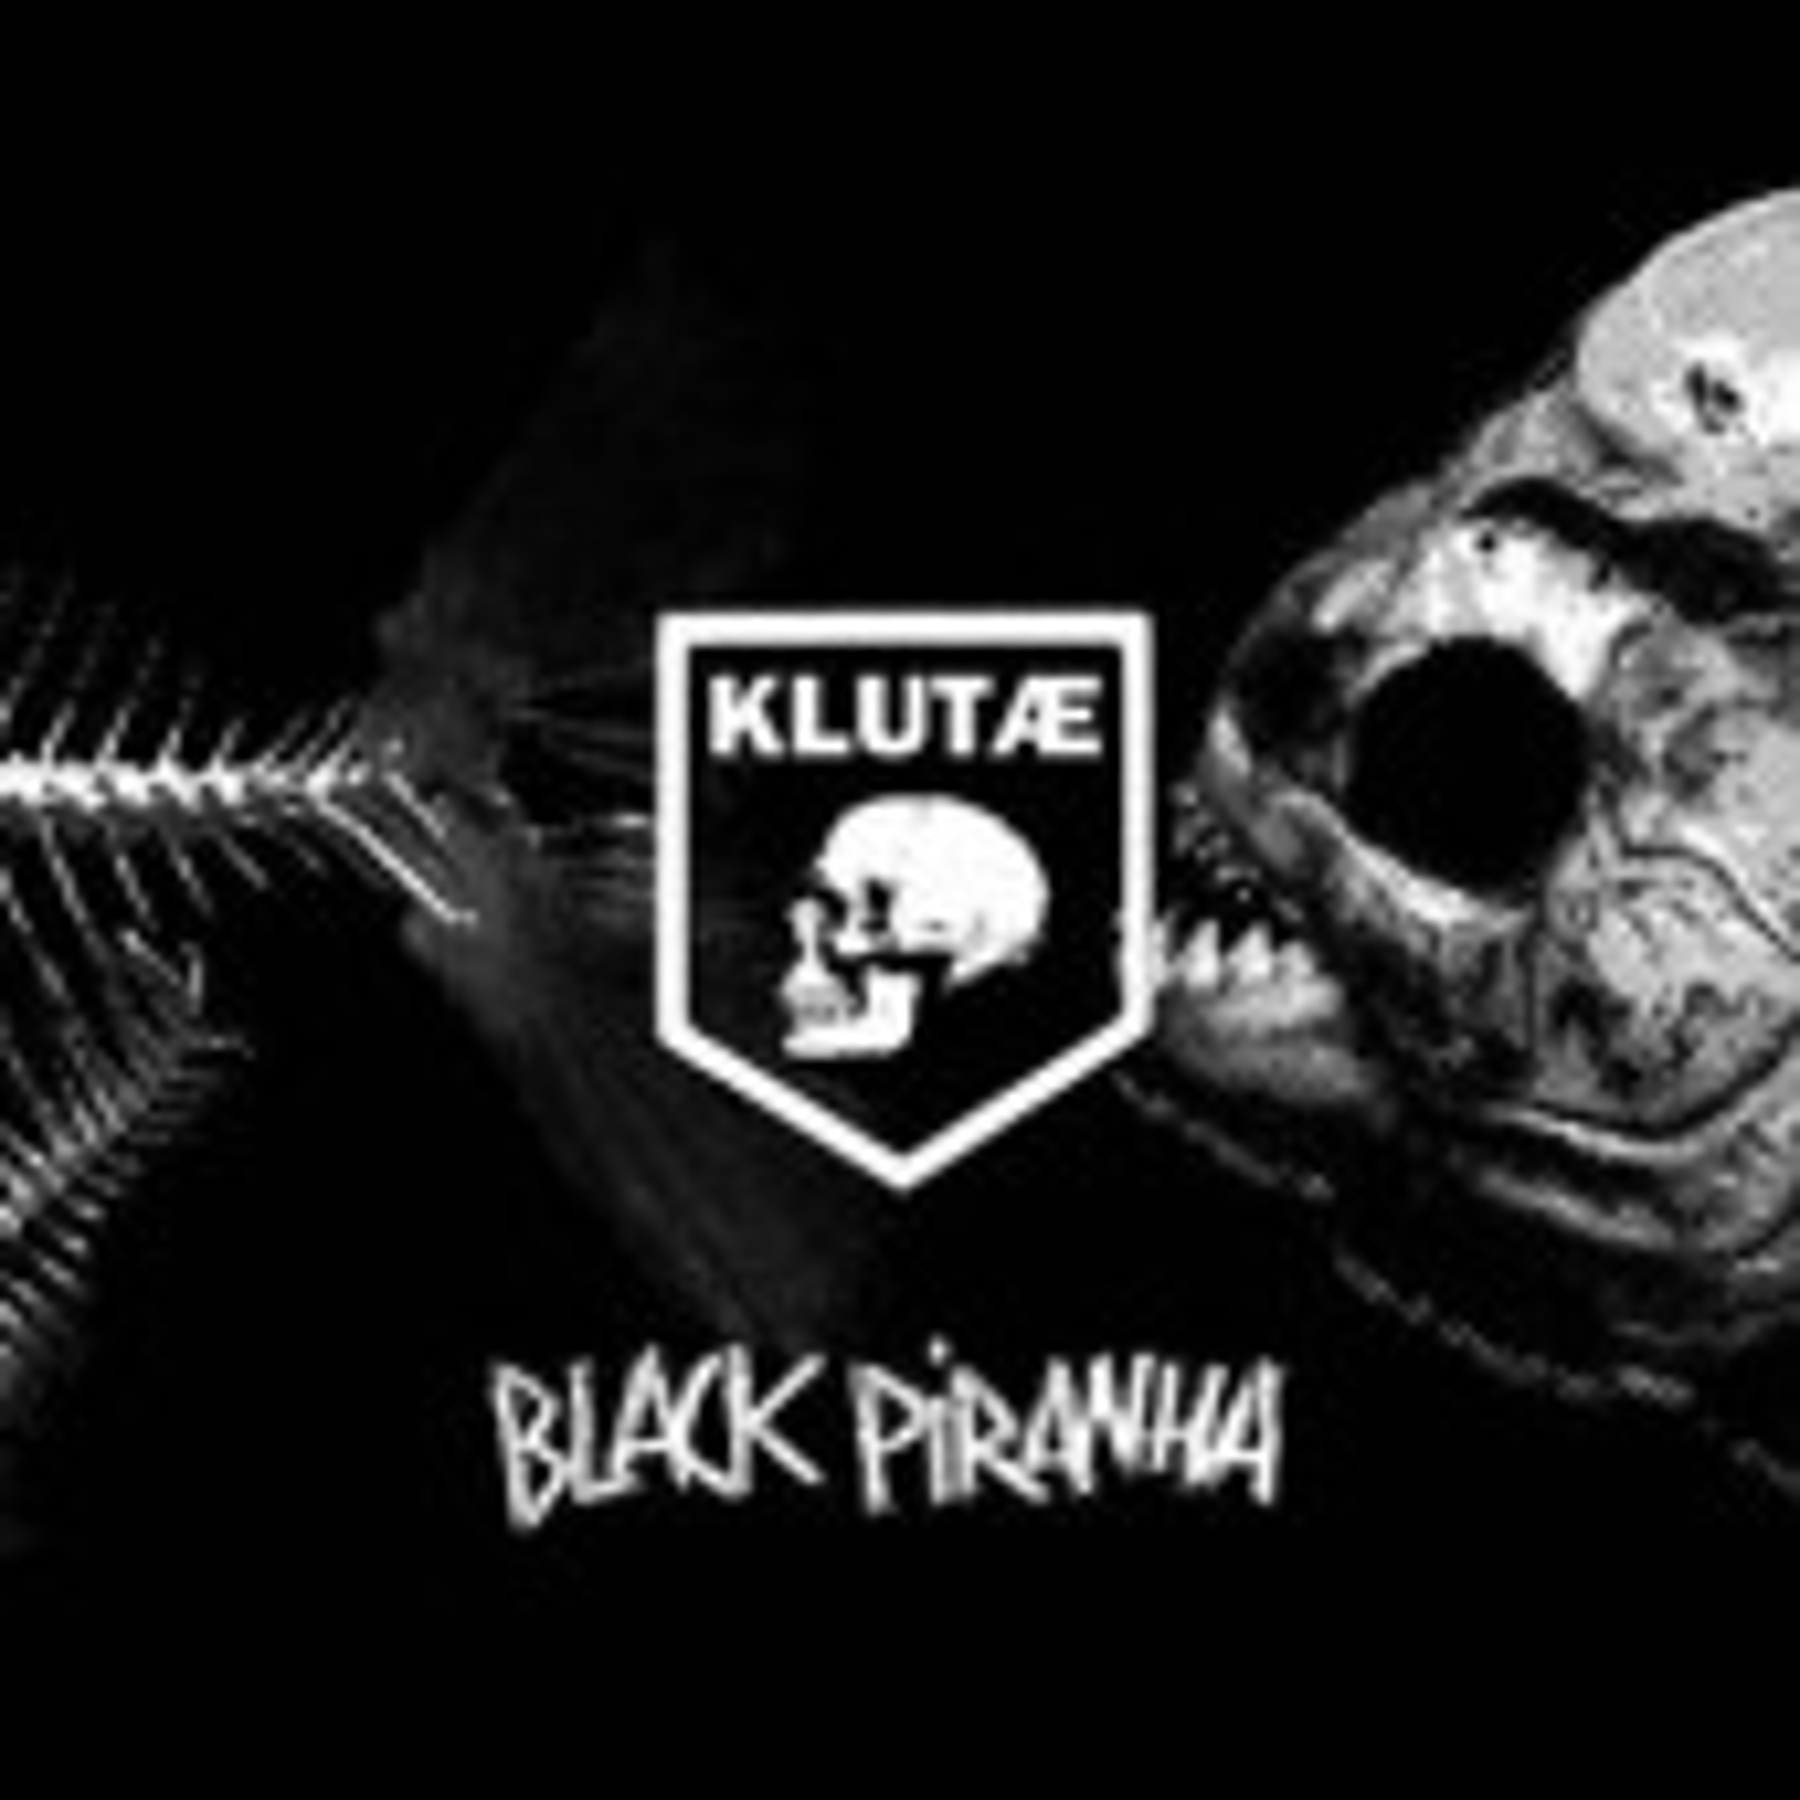 Klutae - Black Piranha - Ltd. CD - signed and hand-numbered